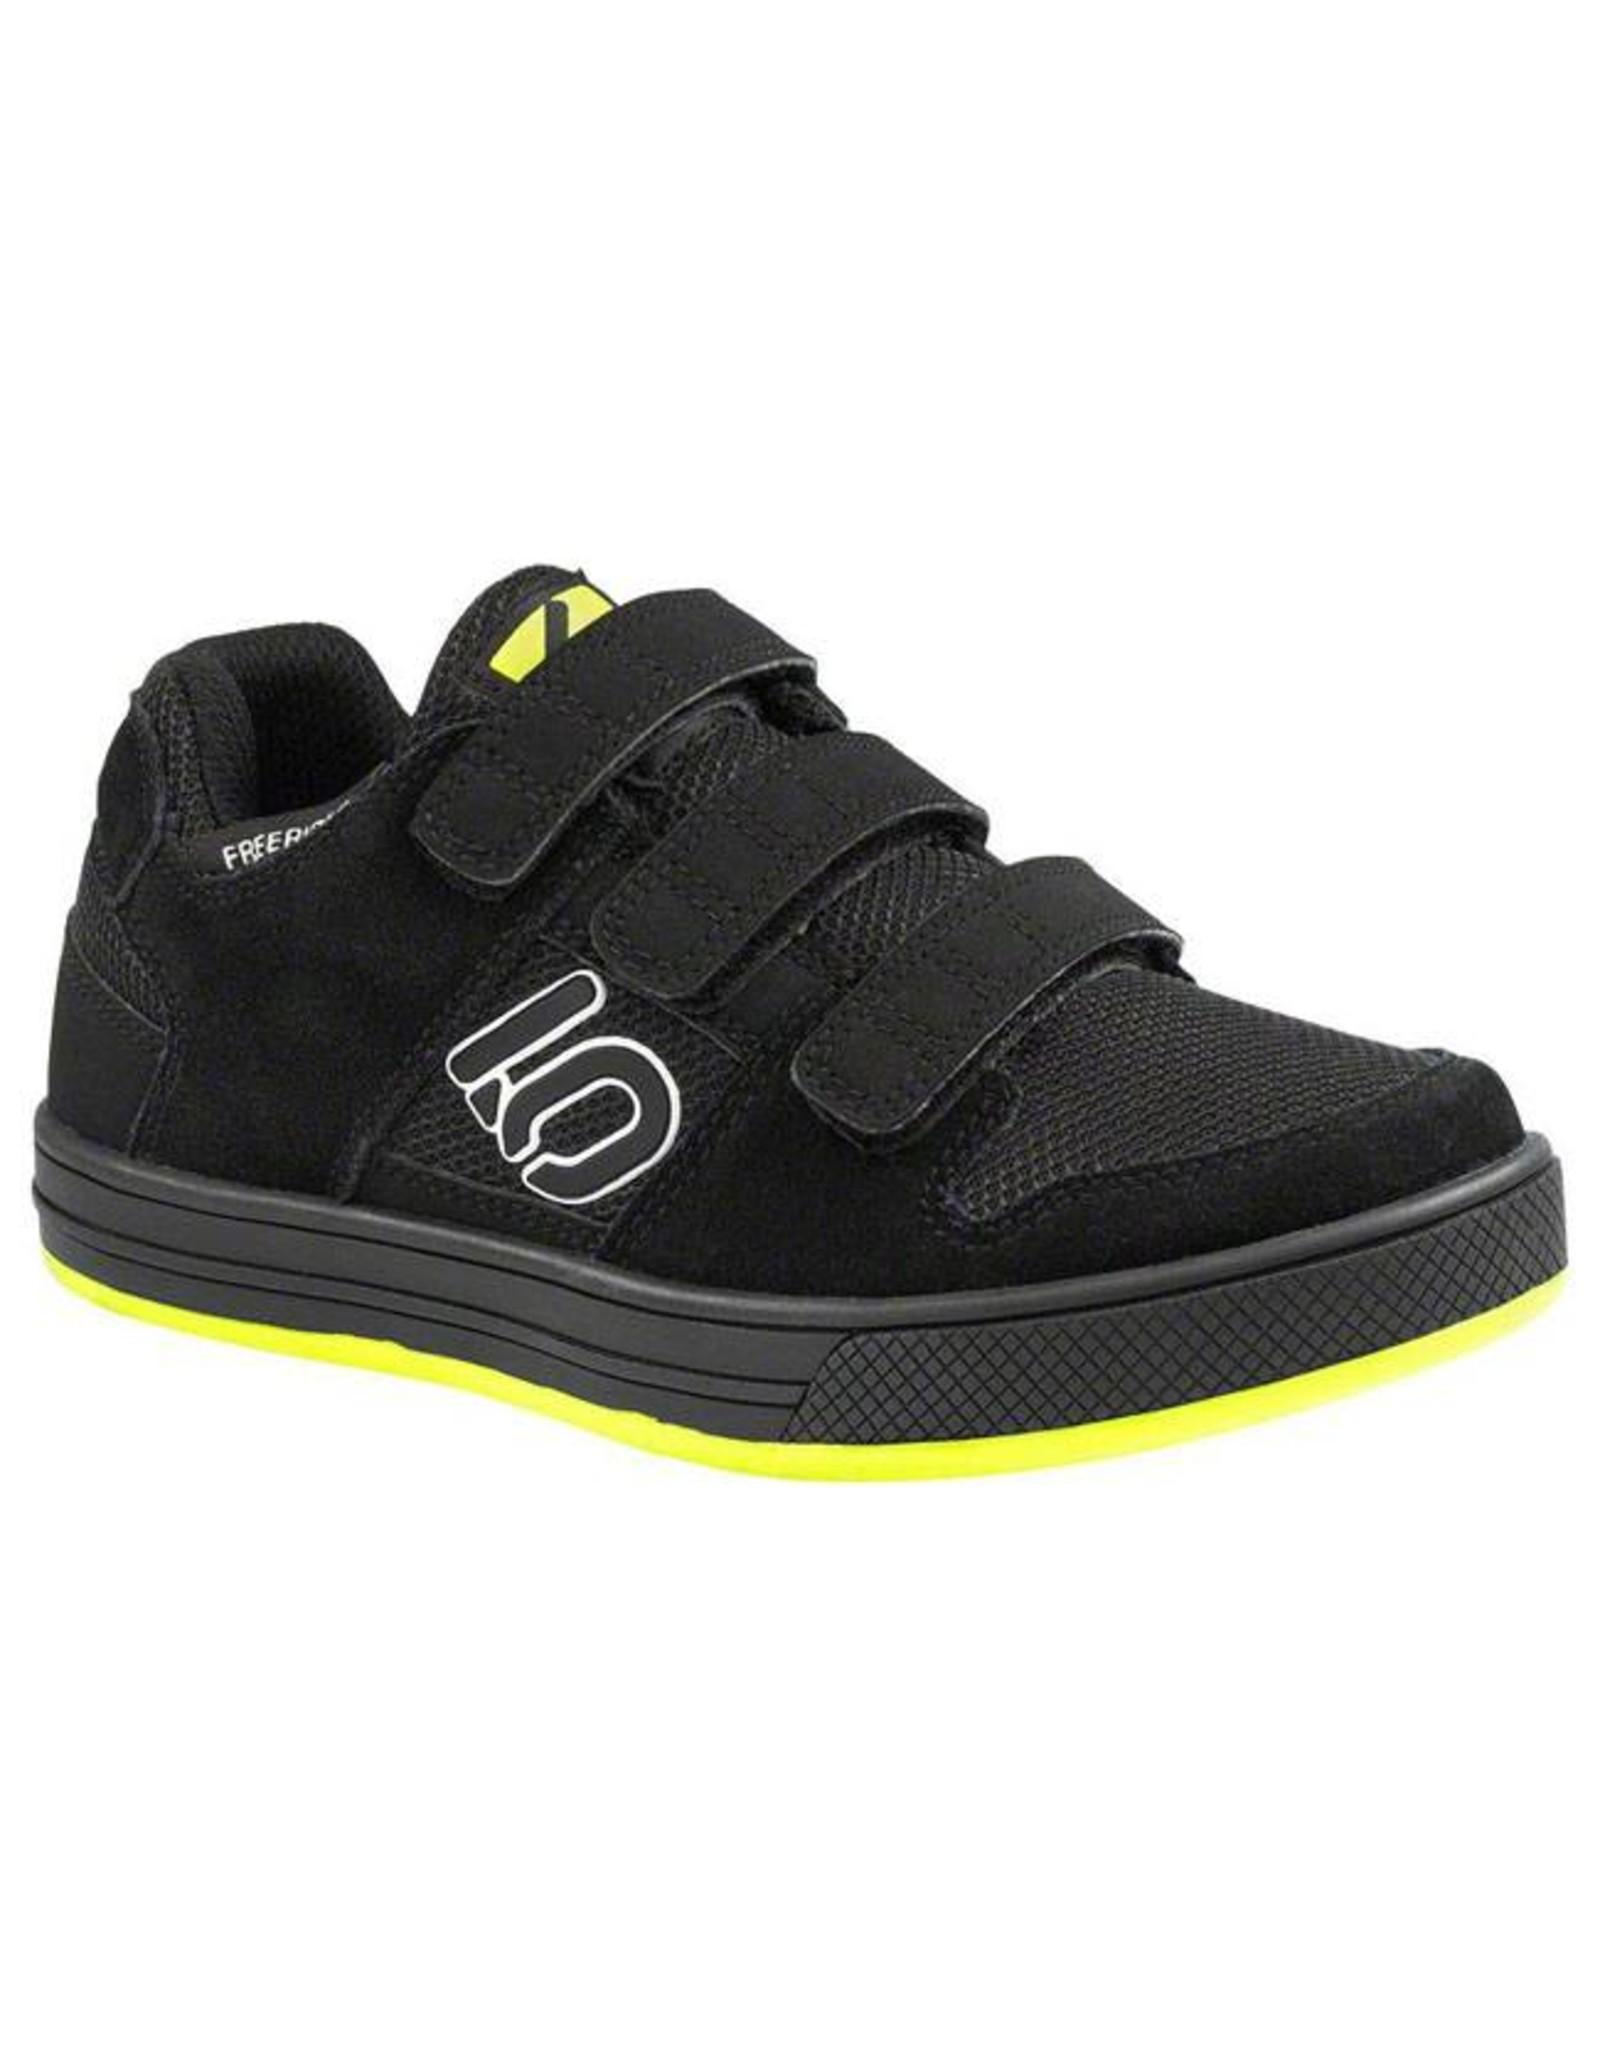 Five Ten Five Ten Freerider Kid's Flat Pedal Shoe: Black 2.5